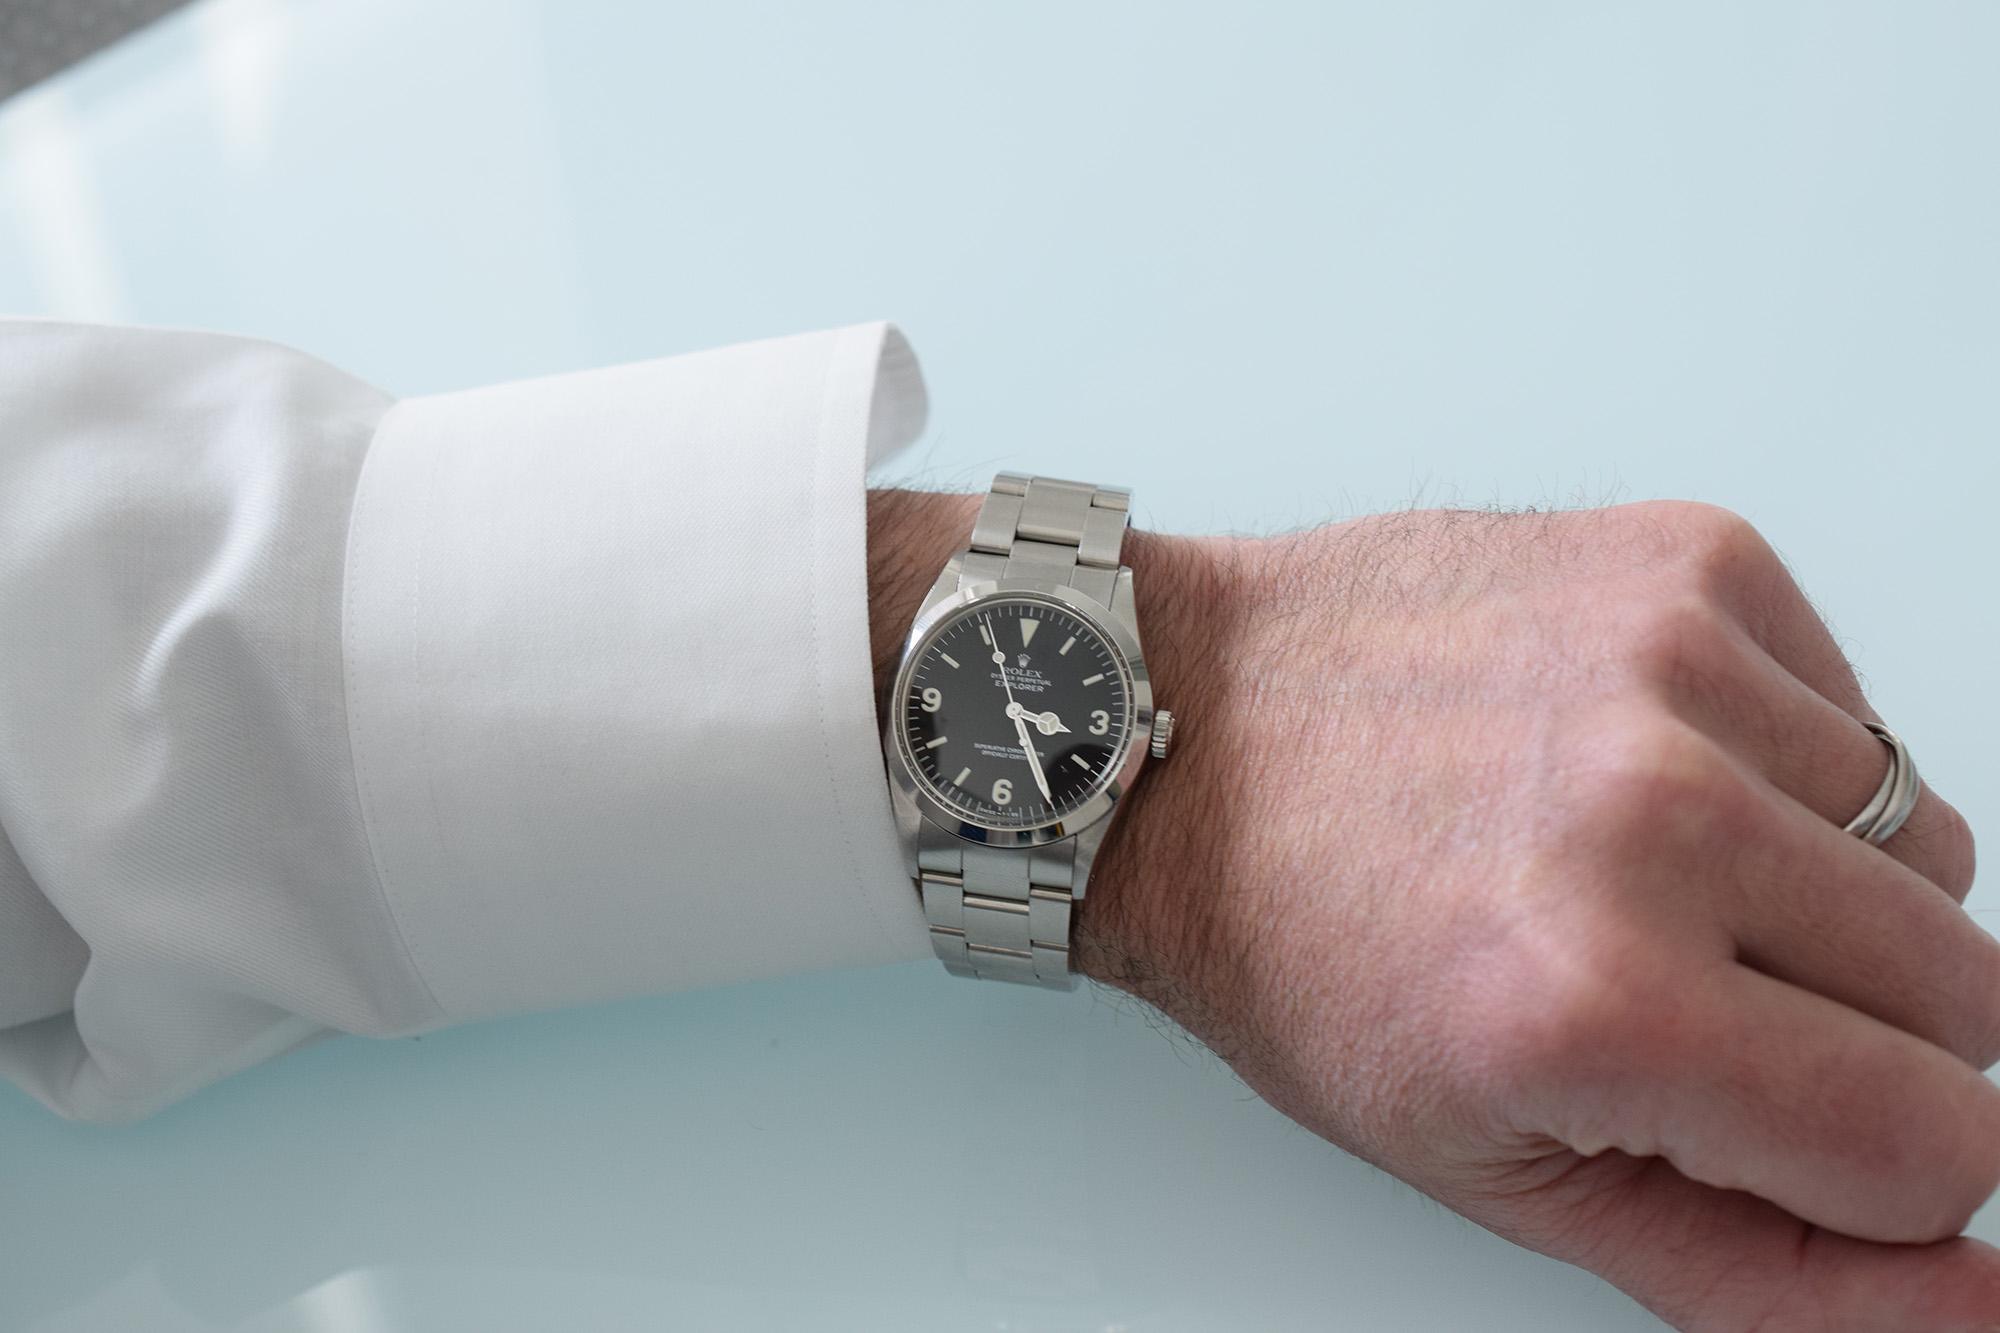 Rolex Explorer 1016 R Series Matte Dial Circa 1987 - Wristshot